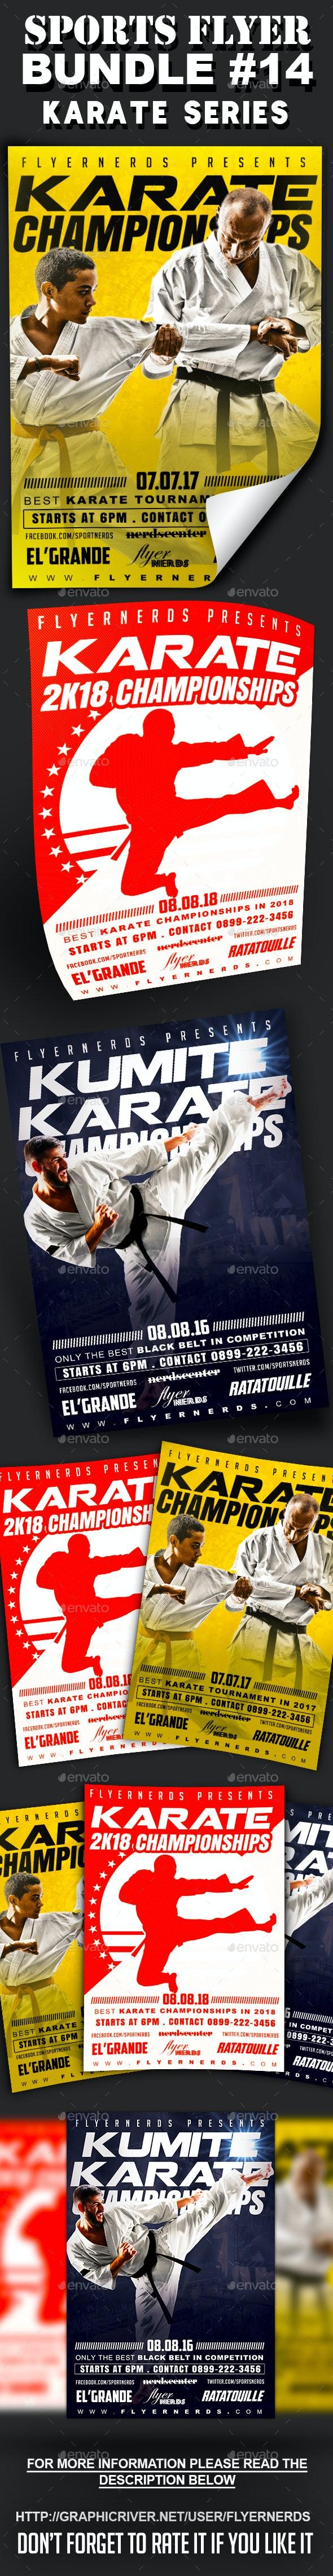 Sports Flyer Bundle 14 Karate Series - Sports Events